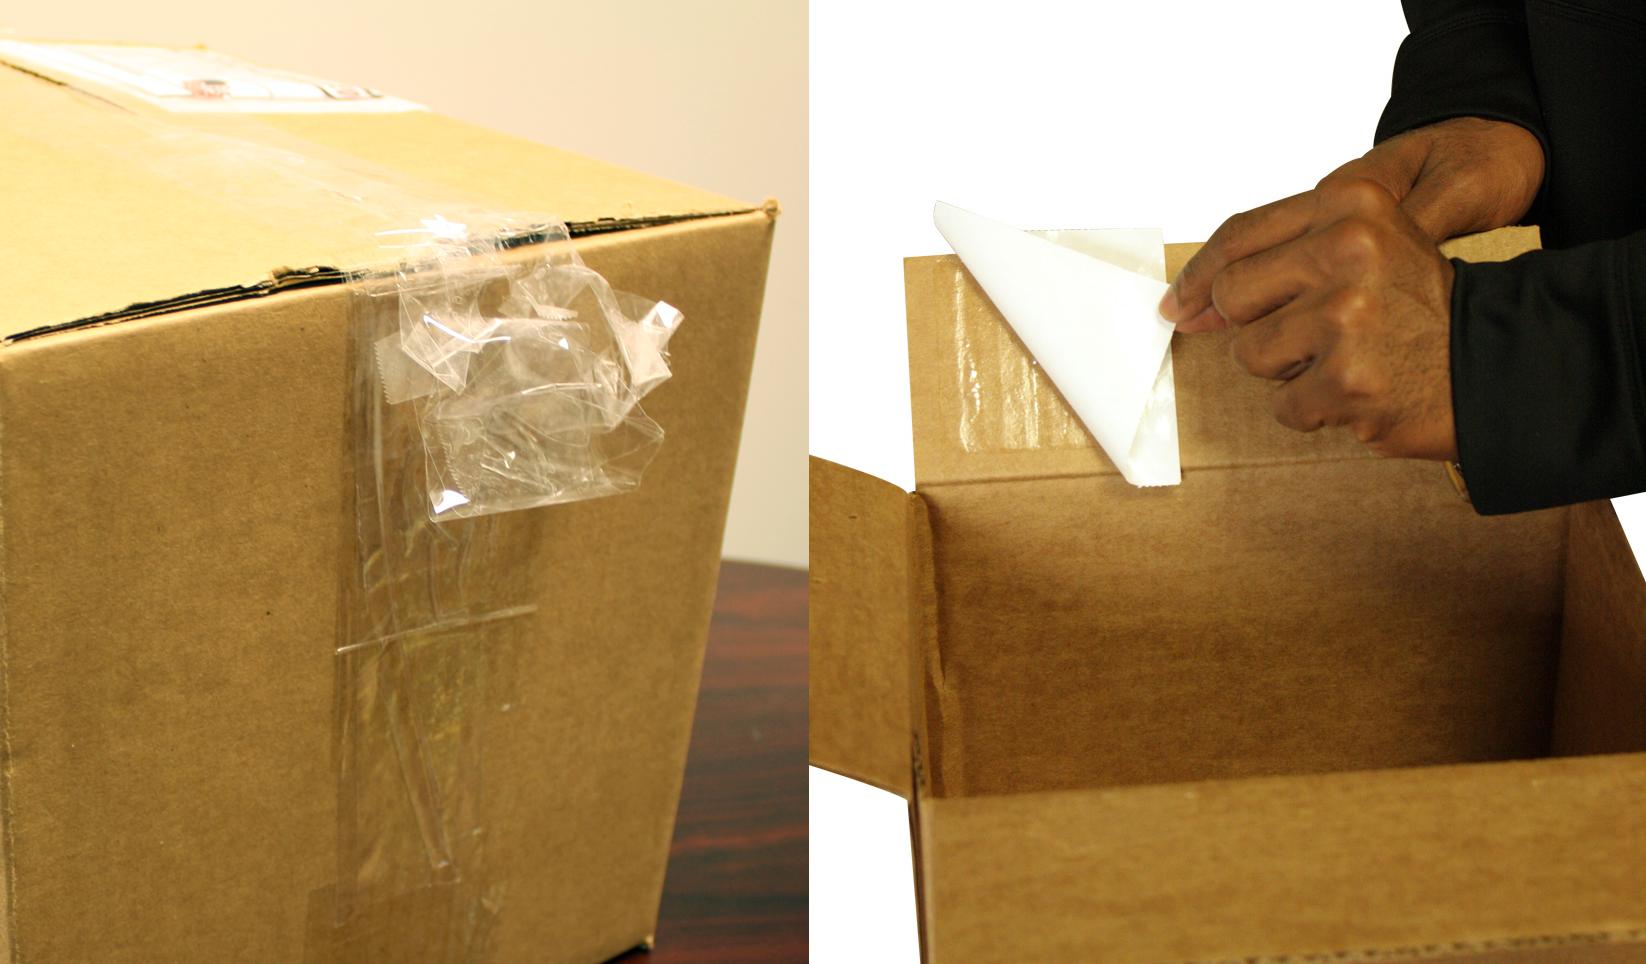 Tape vs. Adhesive Squares™